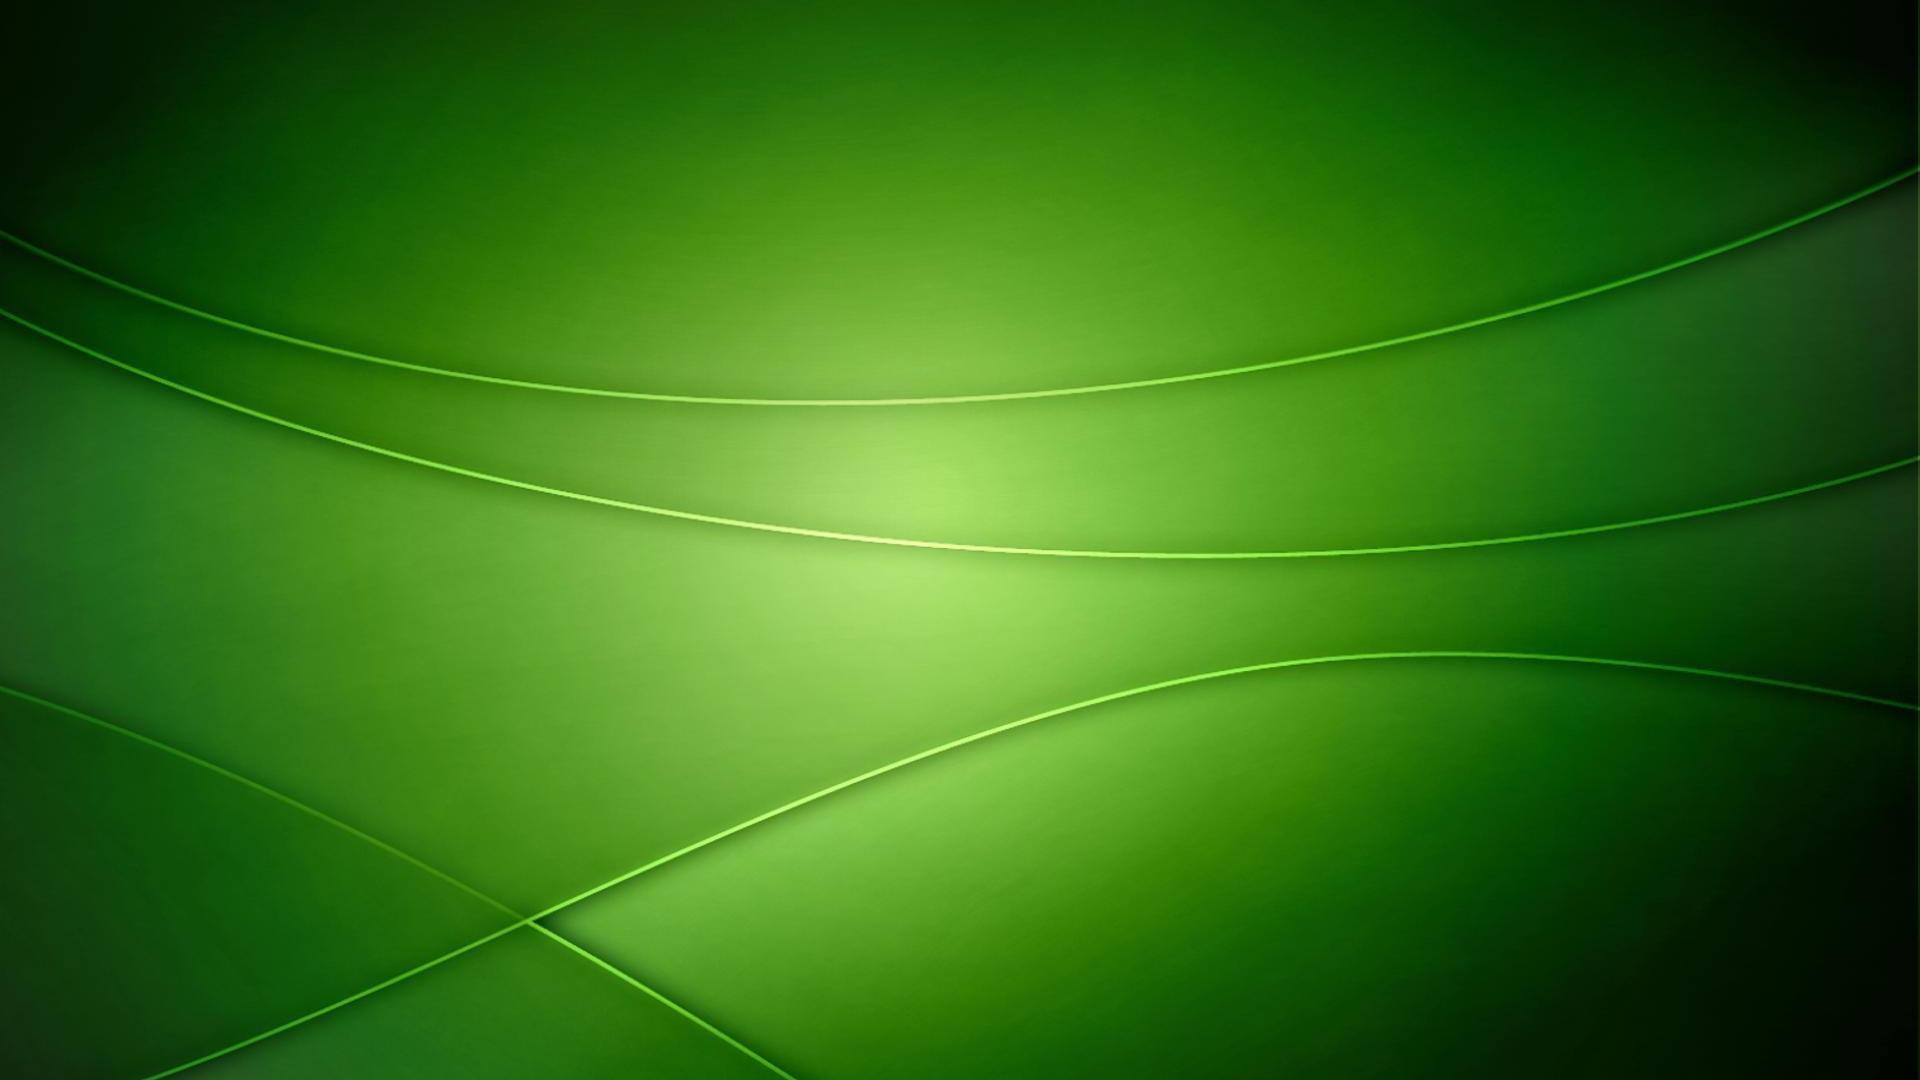 Green Desktop Backgrounds - Wallpaper Cave